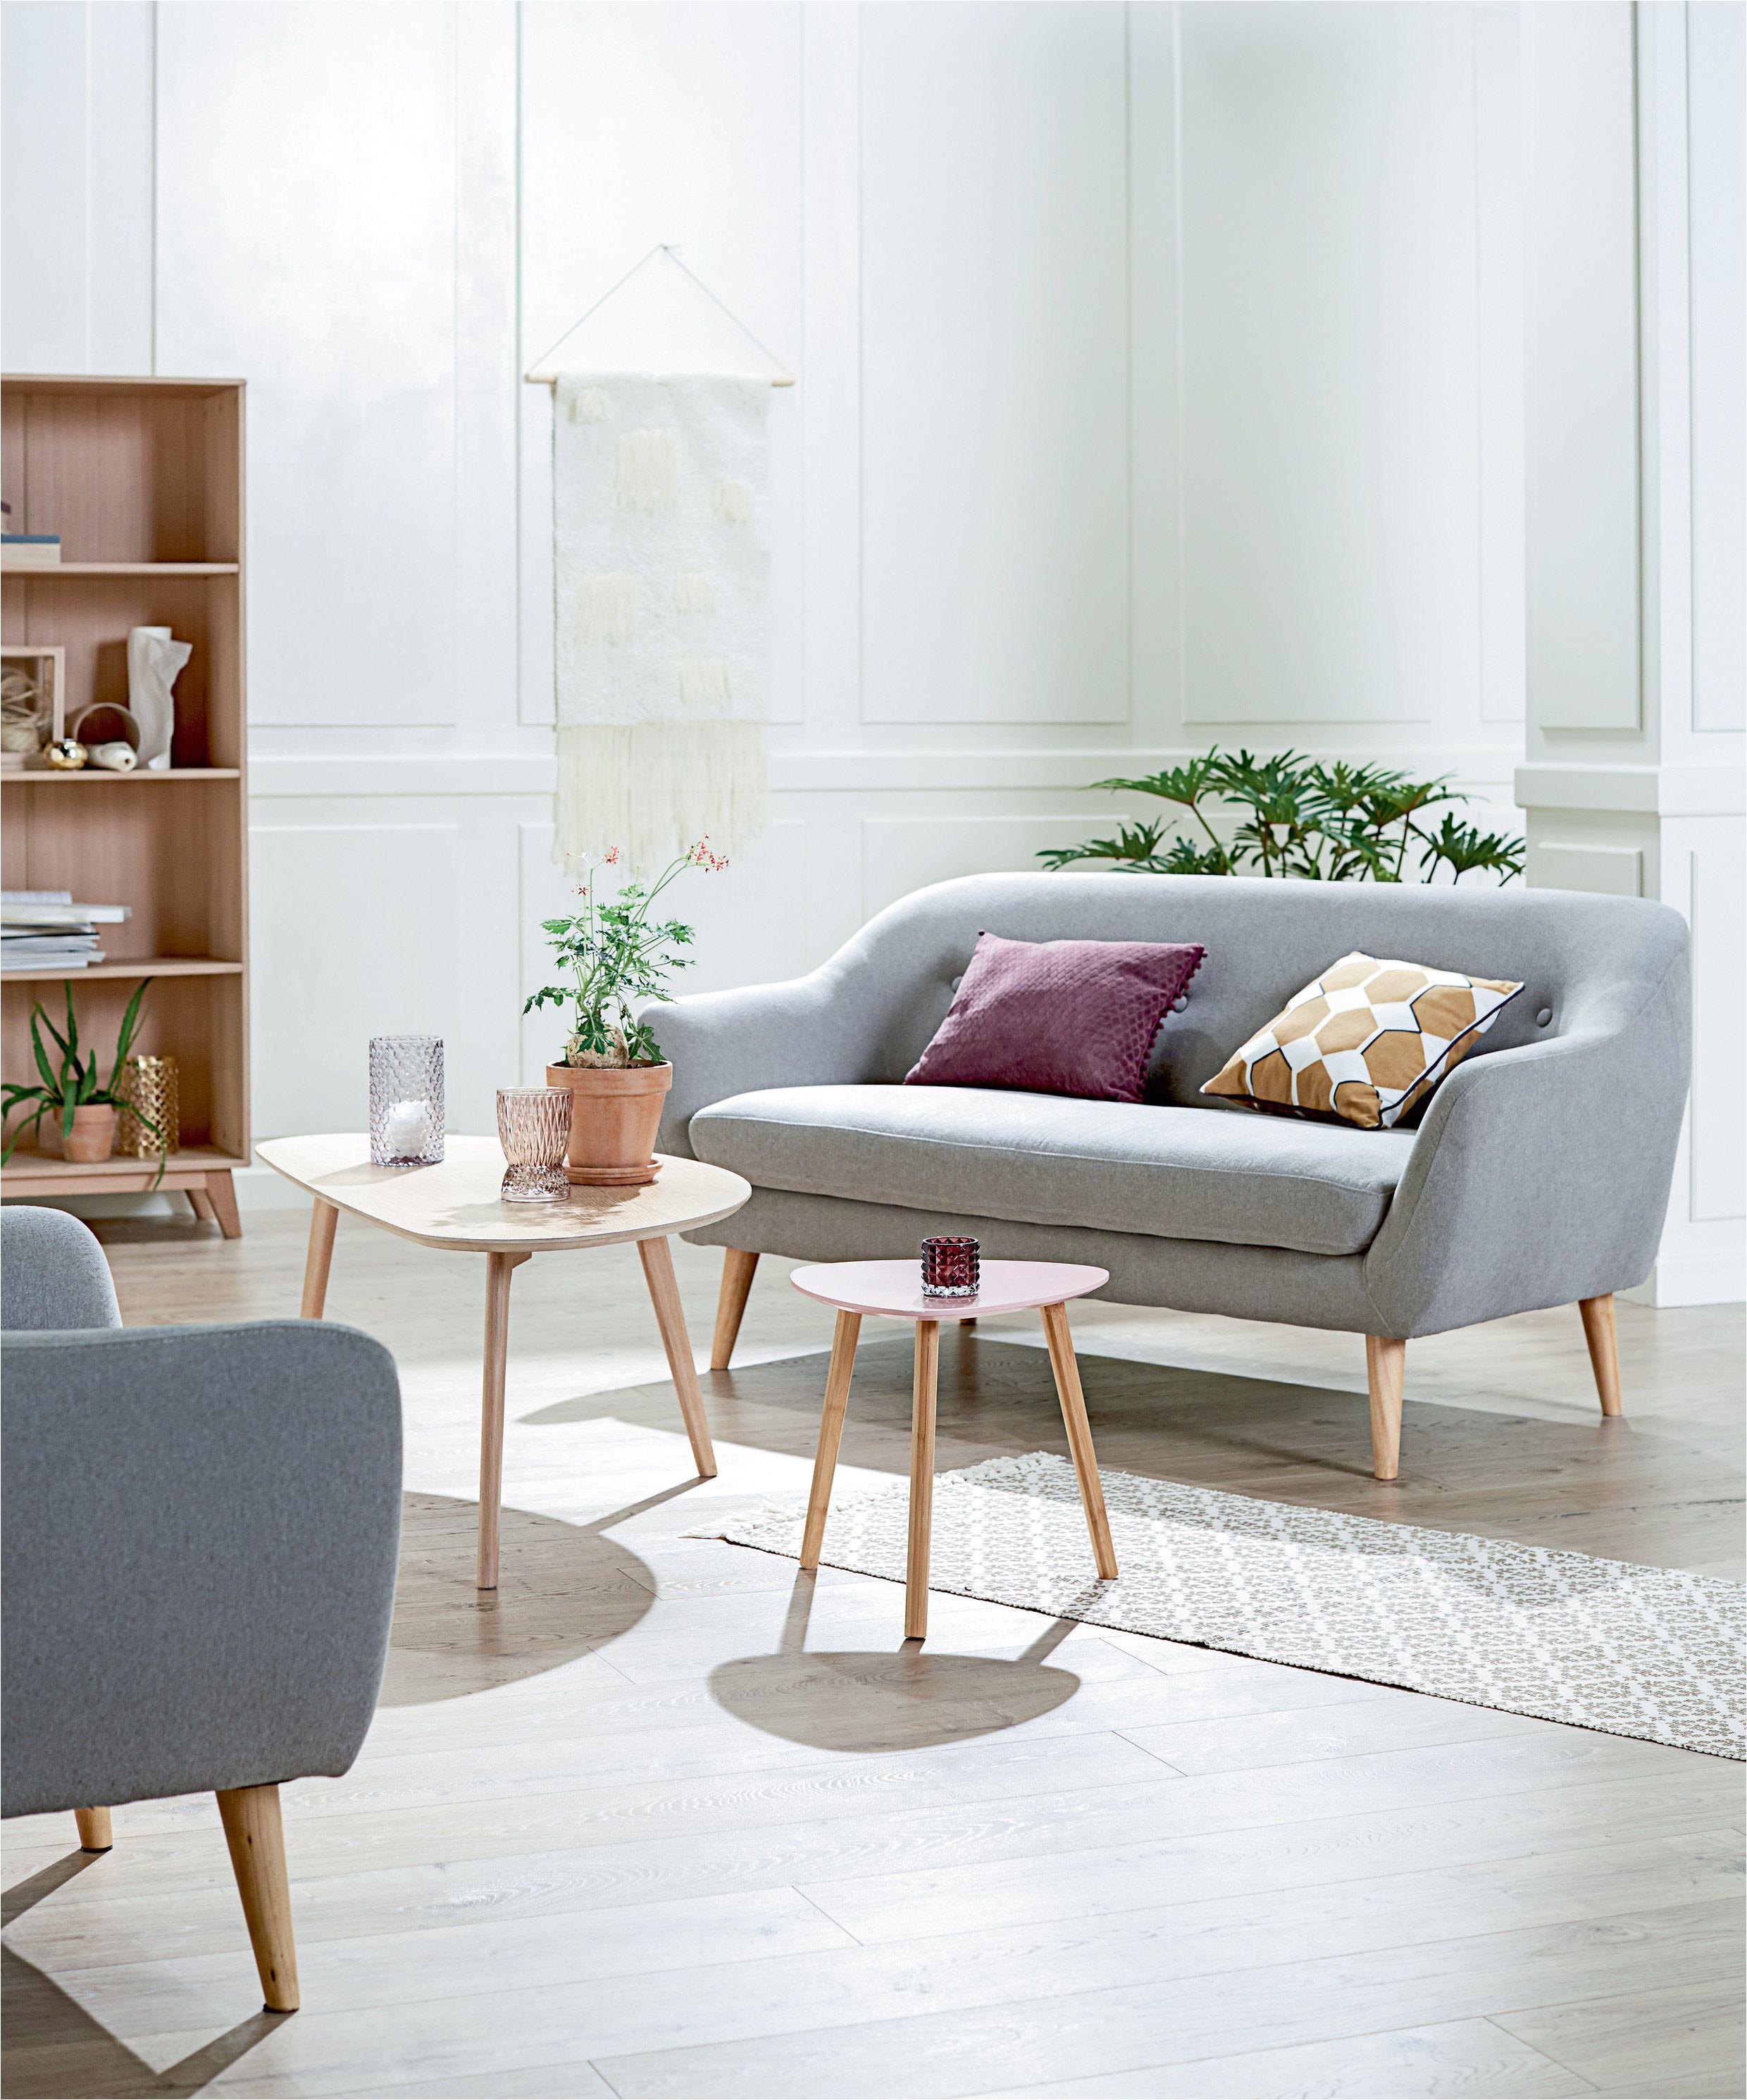 egedal sofa egedal lenestol taps hja rnebord lejre sofabord kalby reol bokhylle skandinaviske hjem nordisk design nordic retro